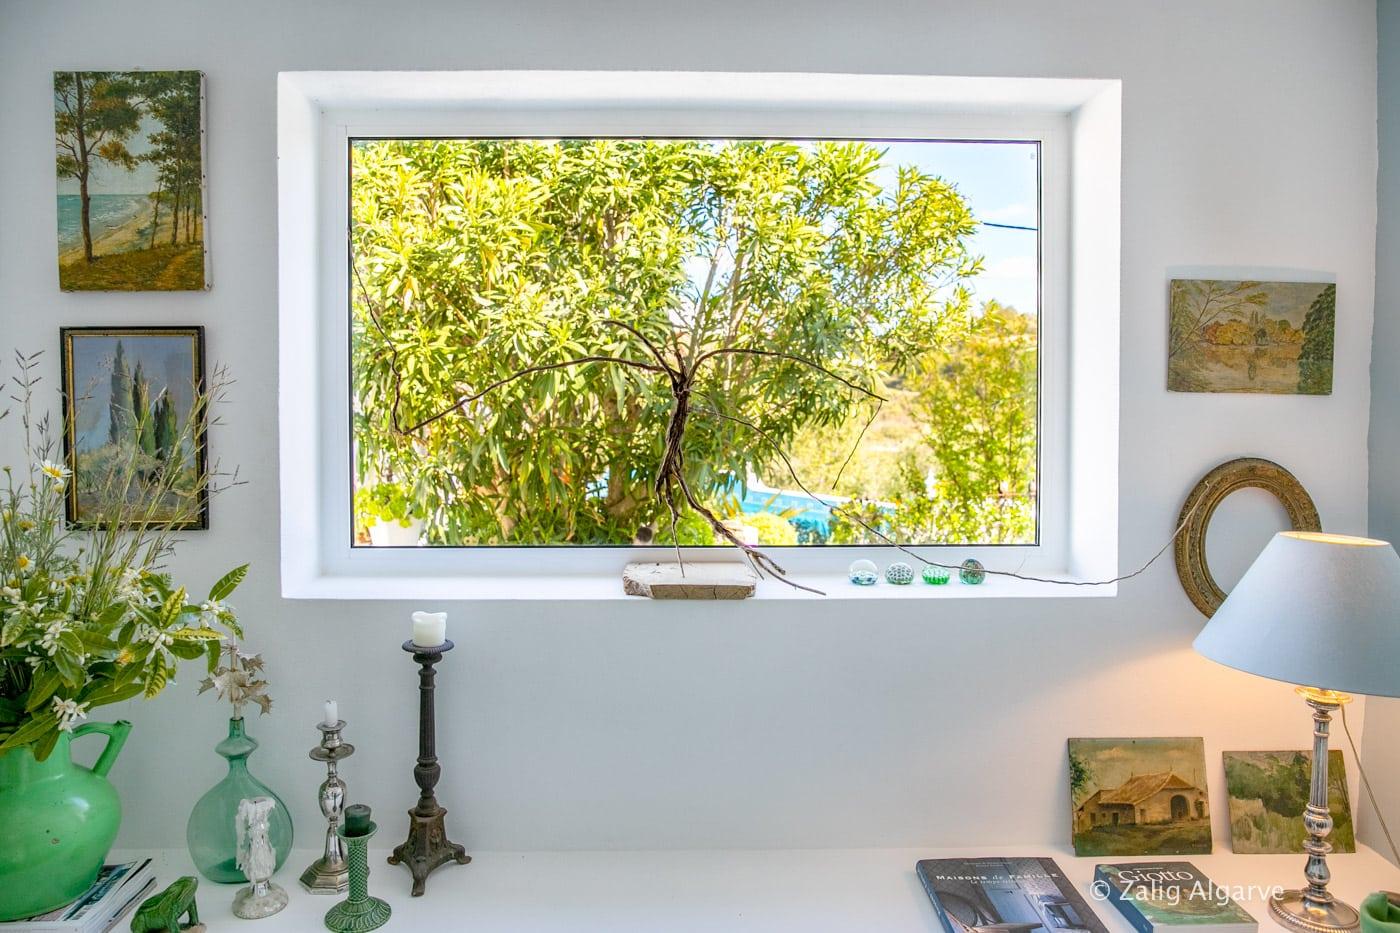 Casa-Alfarrobeira-Zalig-Algarve-23